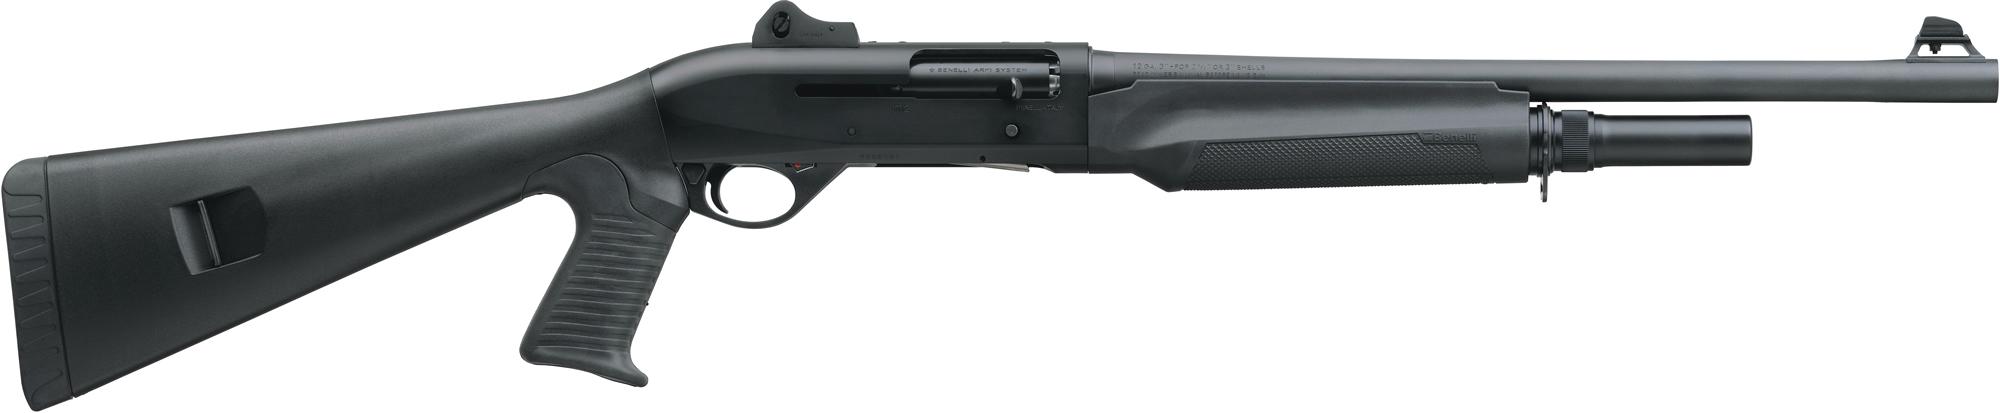 Benelli m2 tactical reviews - Benelli M2 Tactical Semi Auto Shotgun 11052 12 Gauge